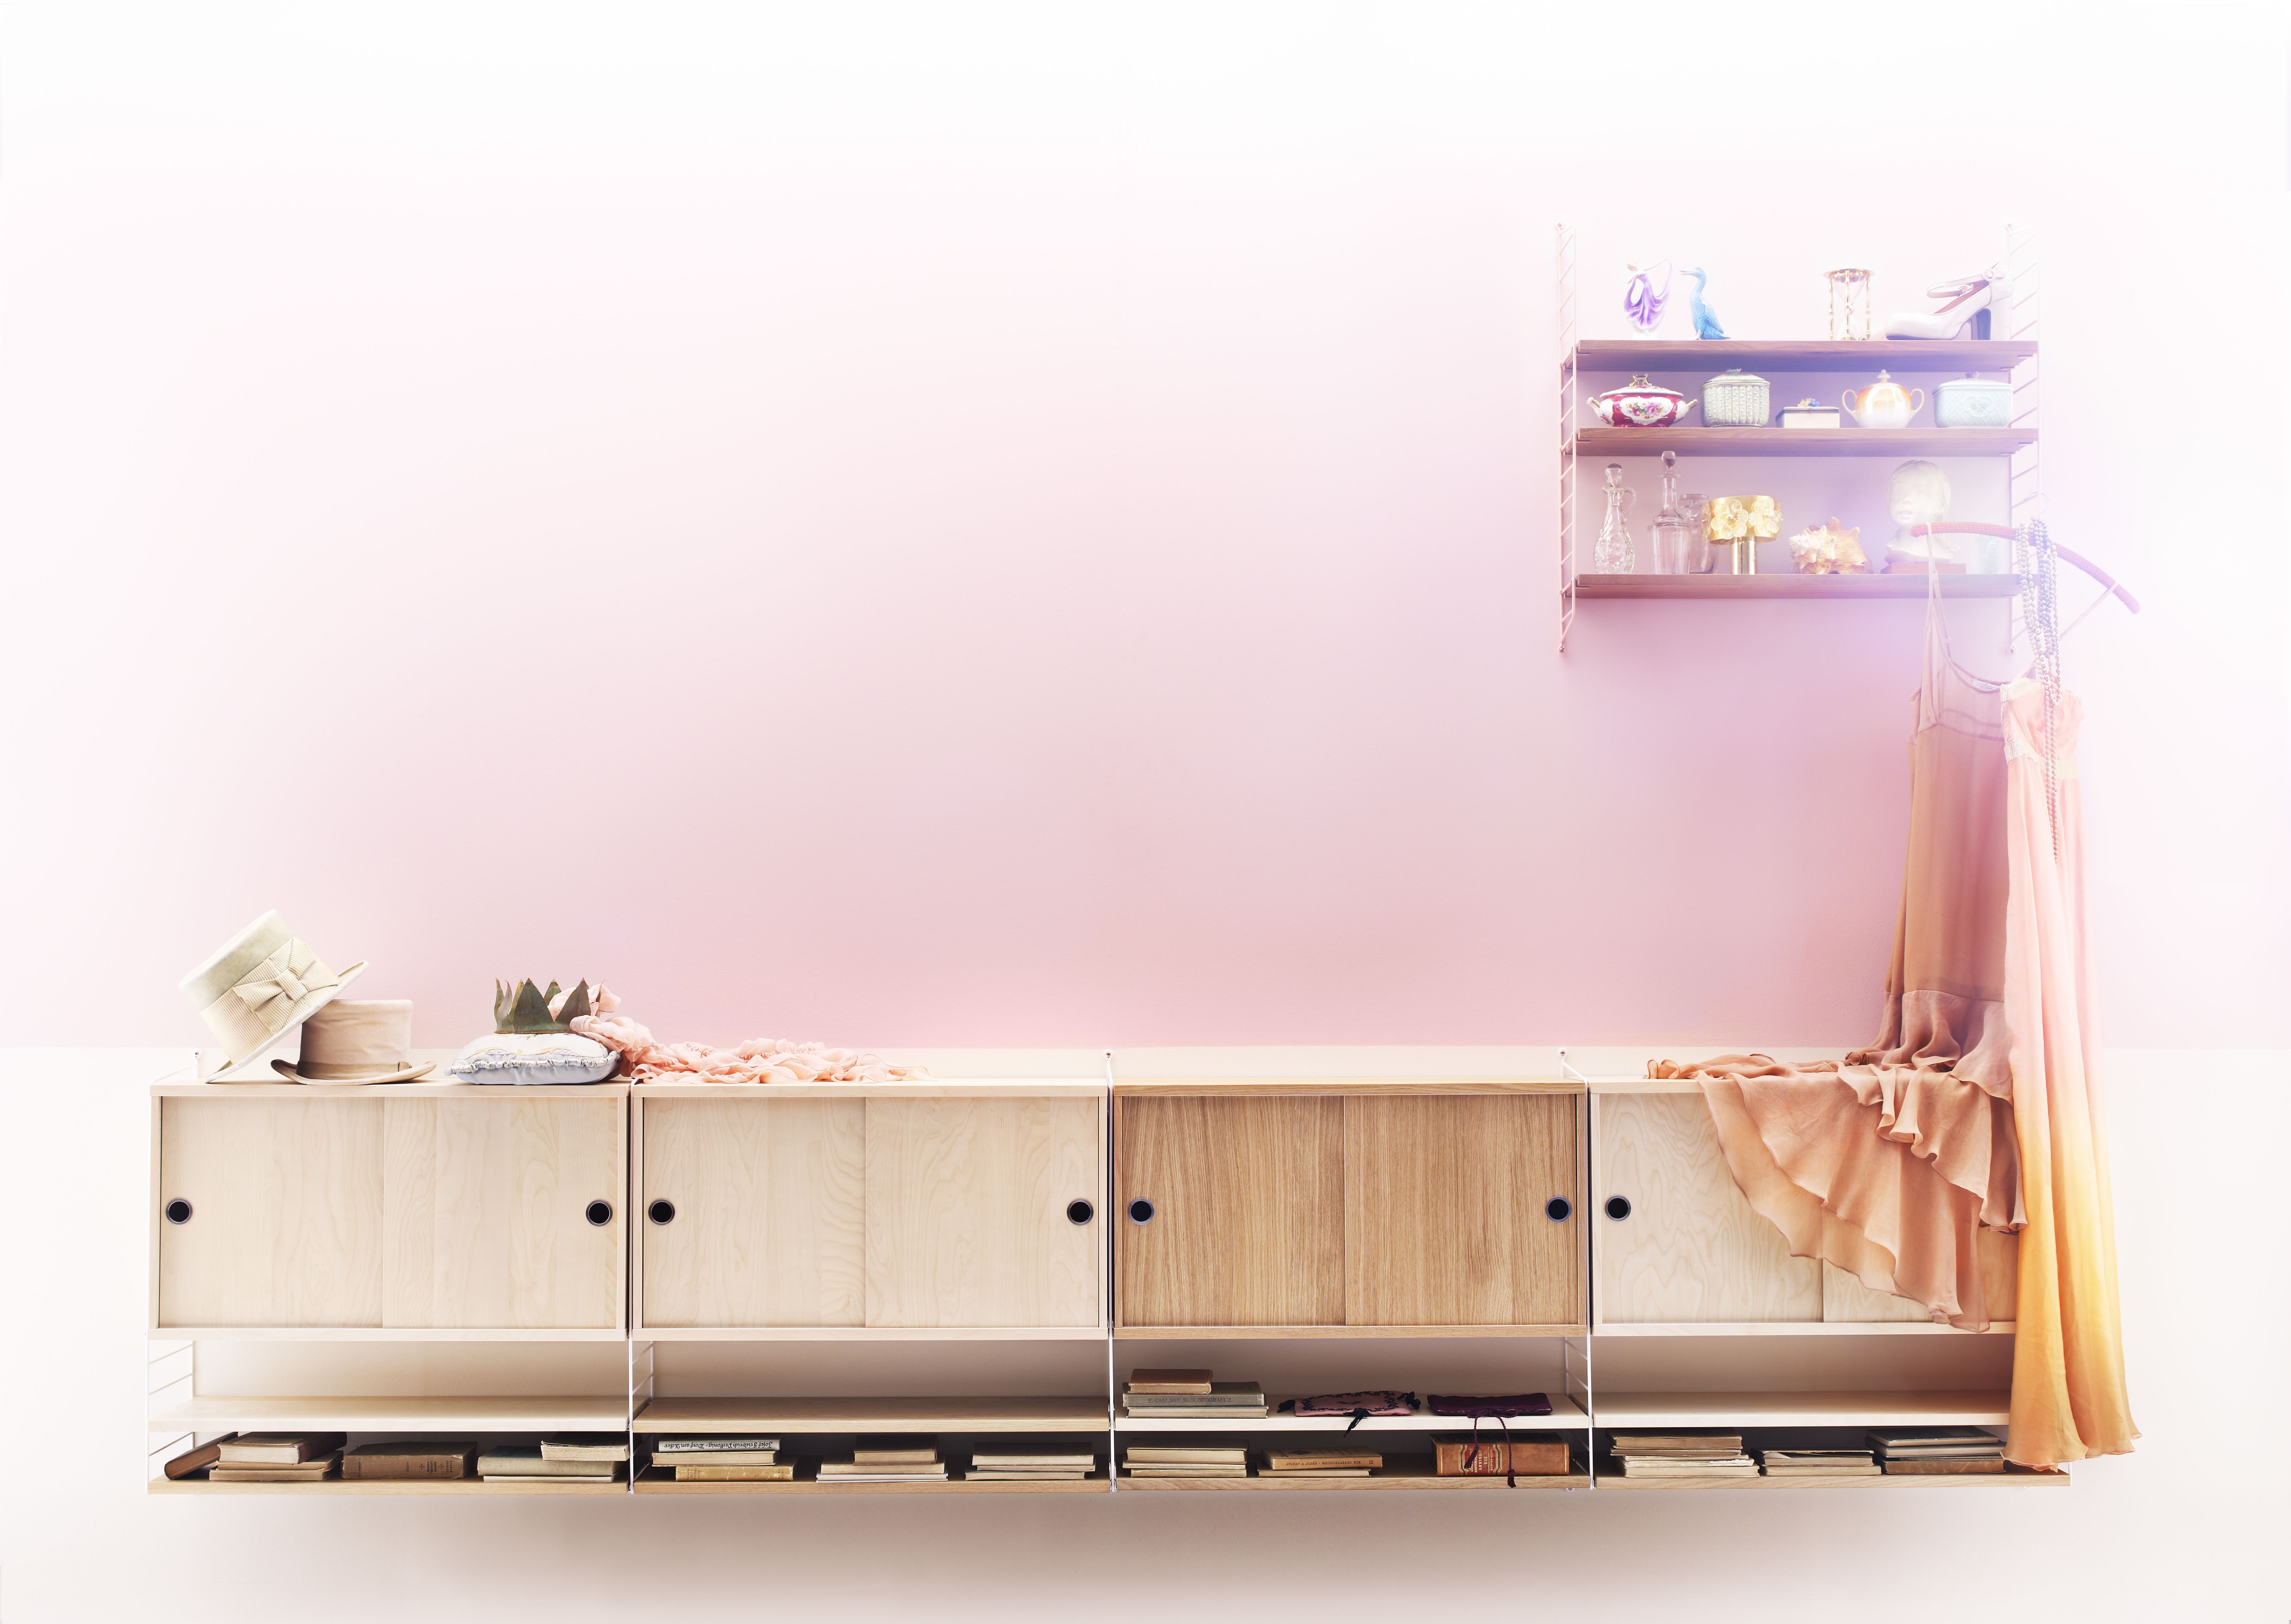 Design String Kasten : Different shades of wood createspace string system furniture